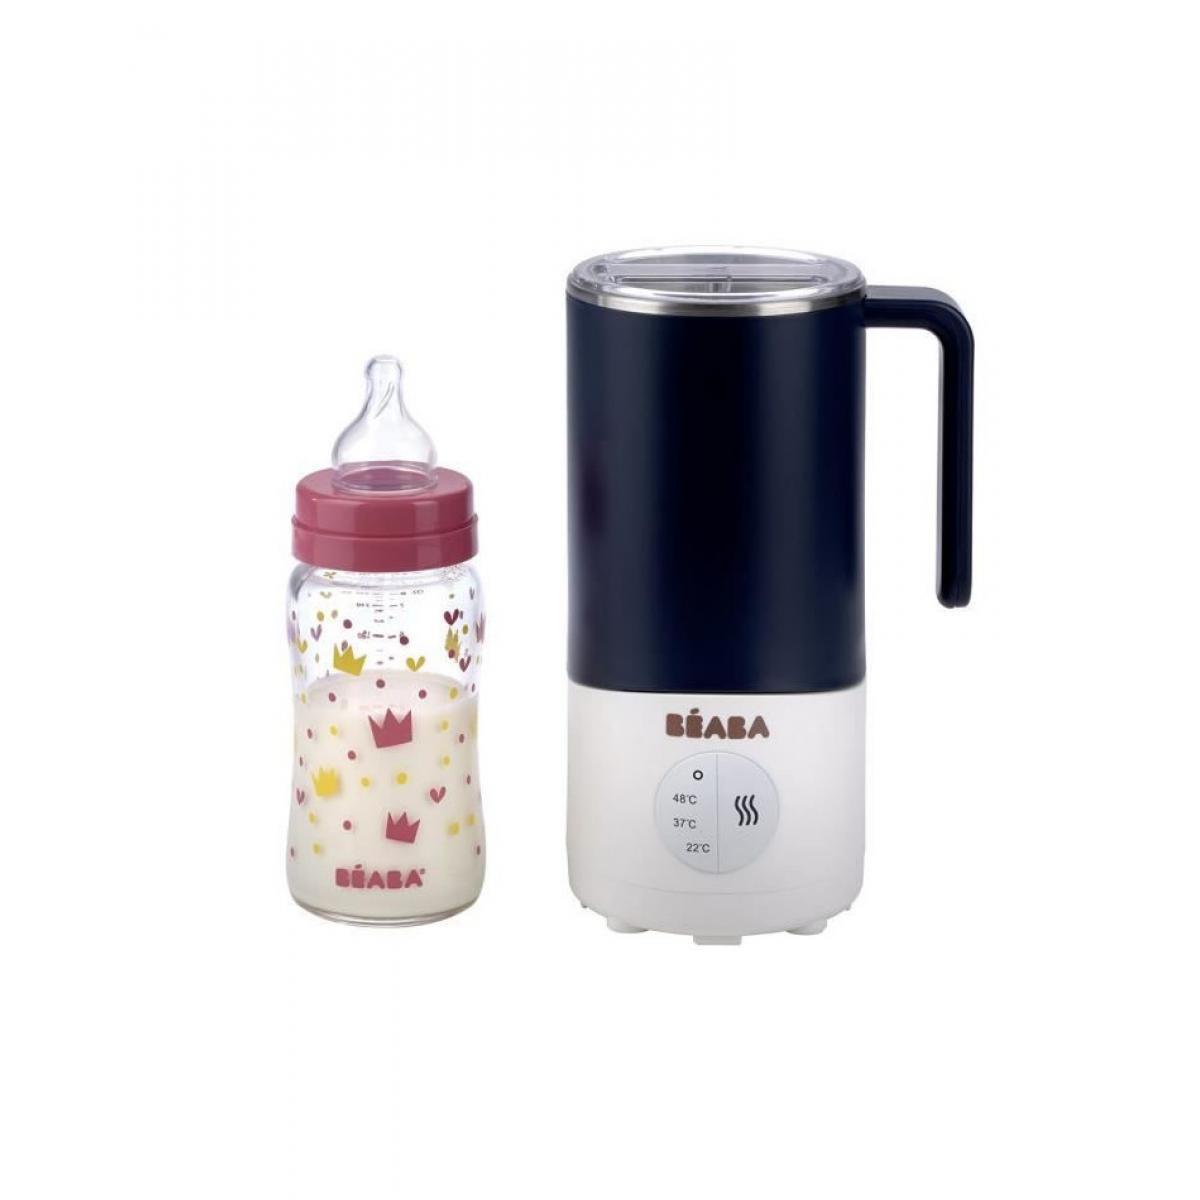 Beaba BEABA Milk Prep : Préparateur boisson - bleu nuit